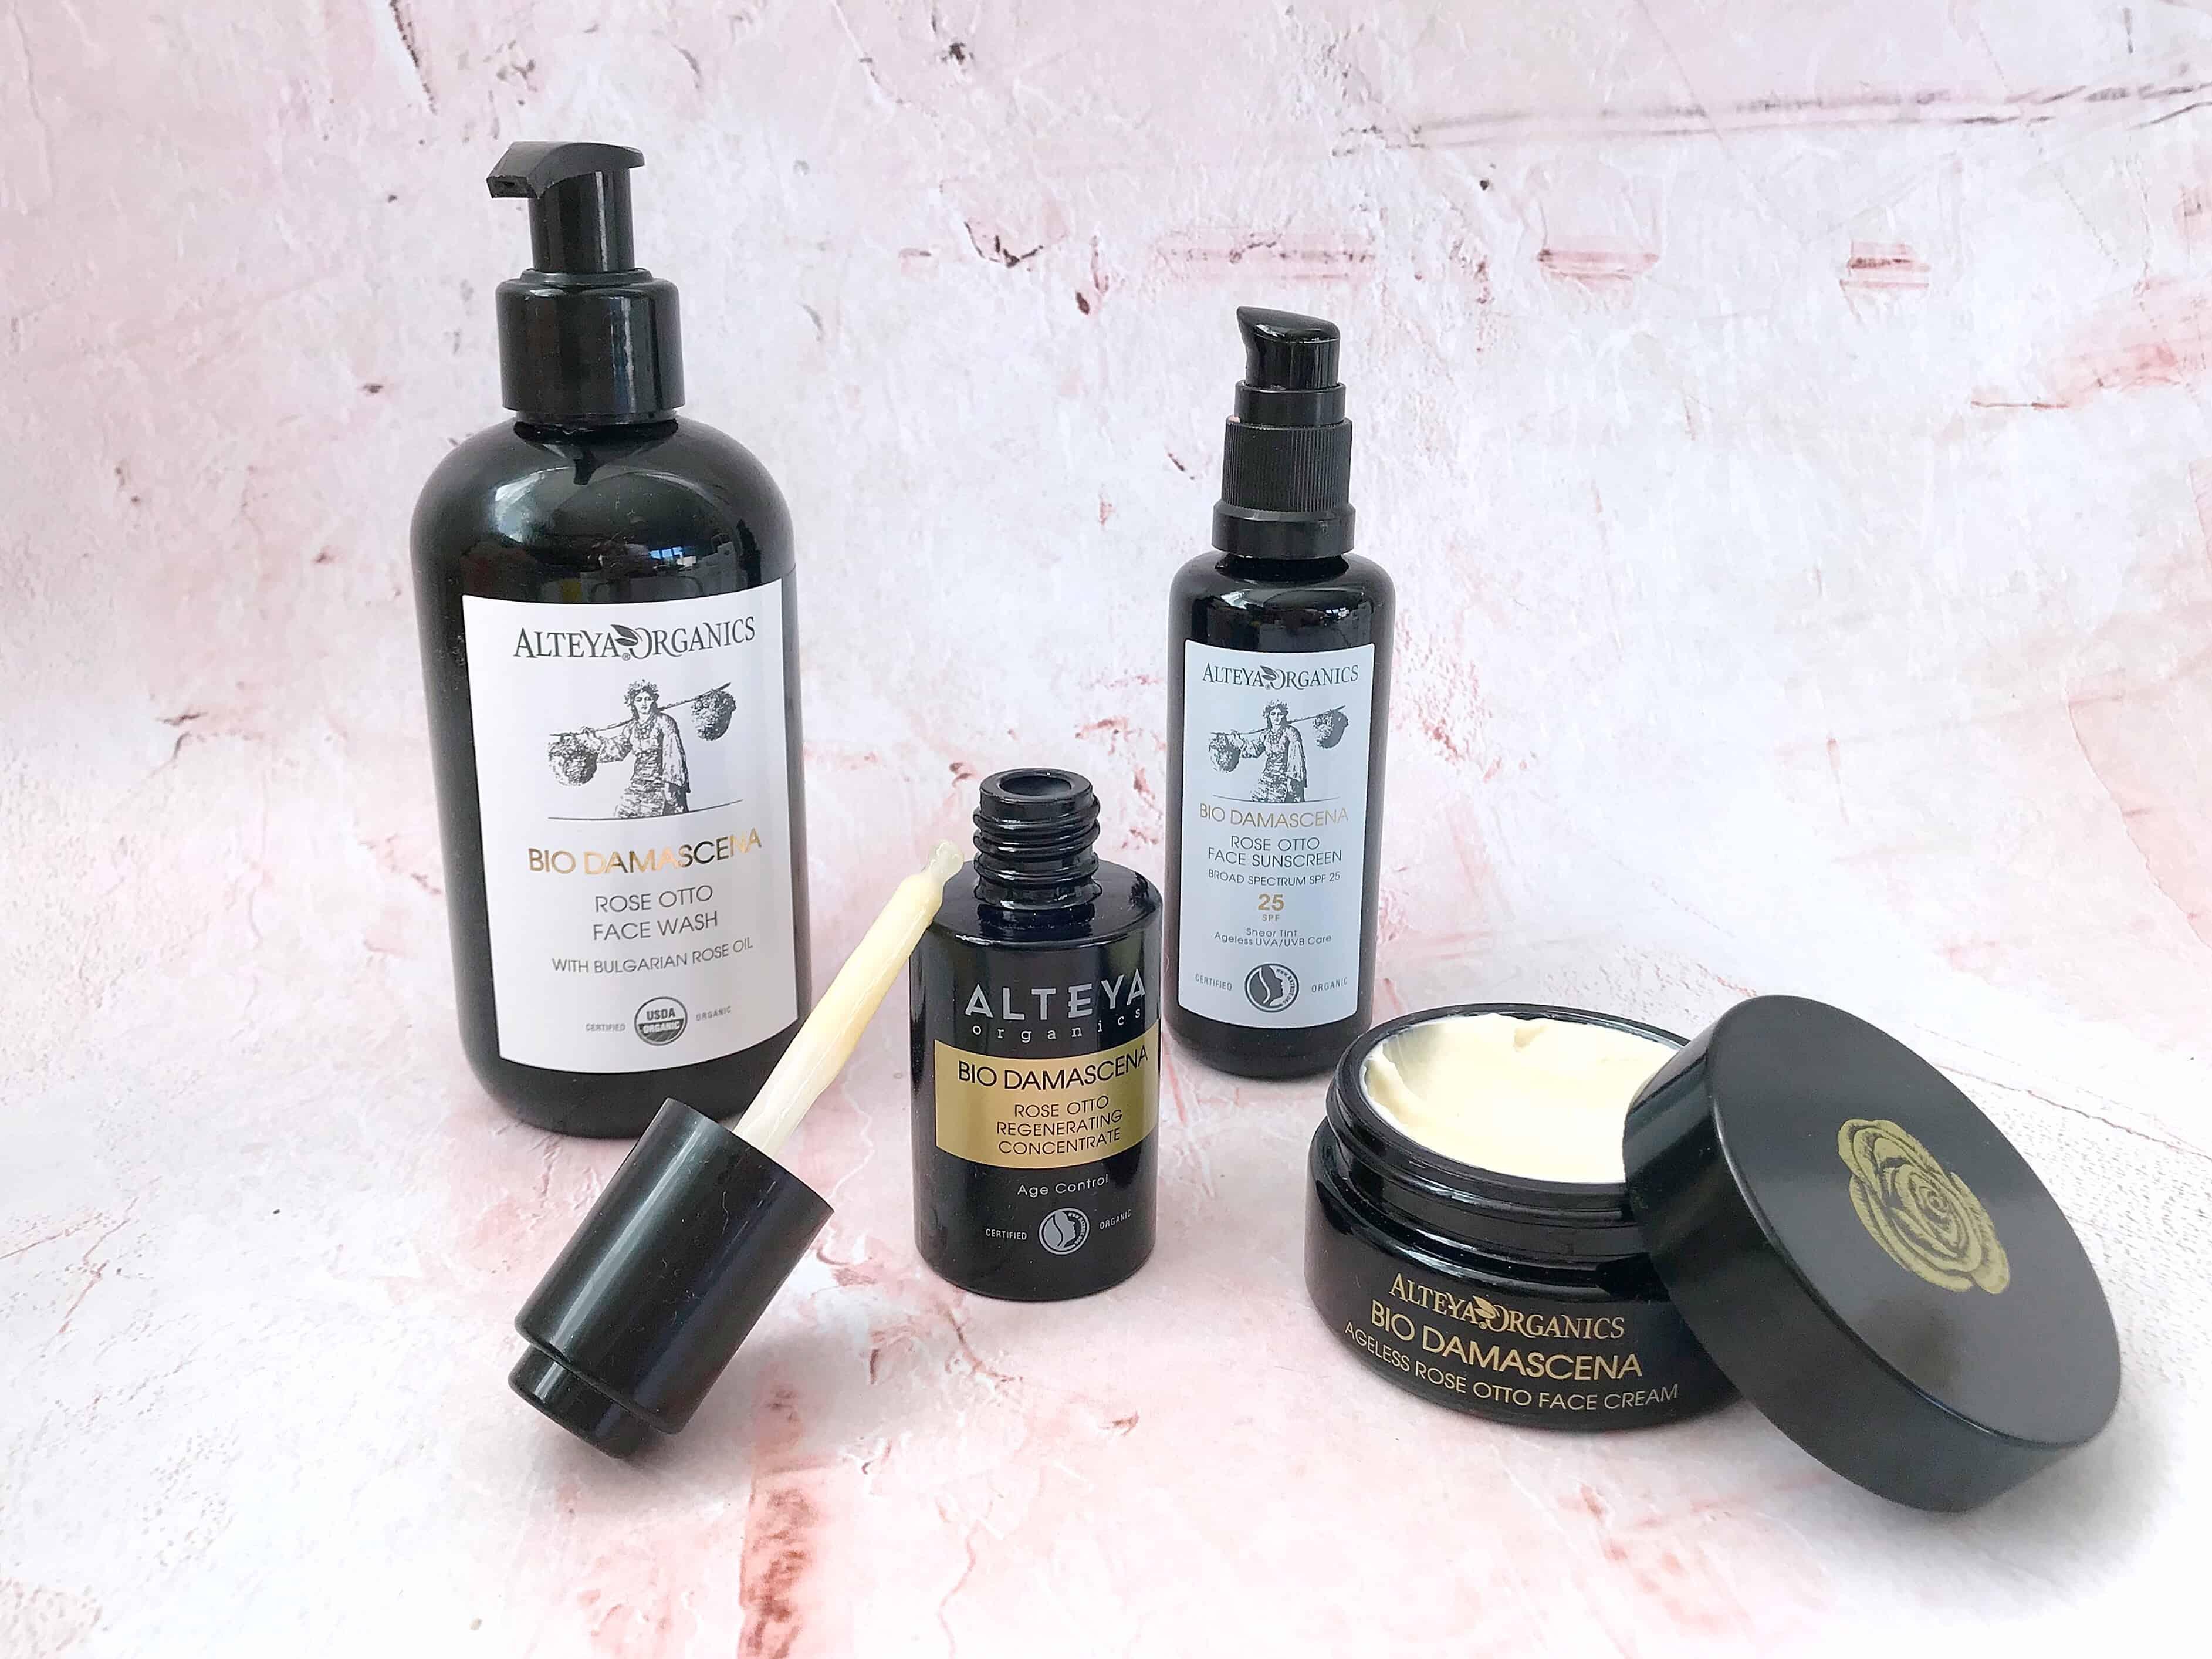 Alteya Organics Skin Care Review